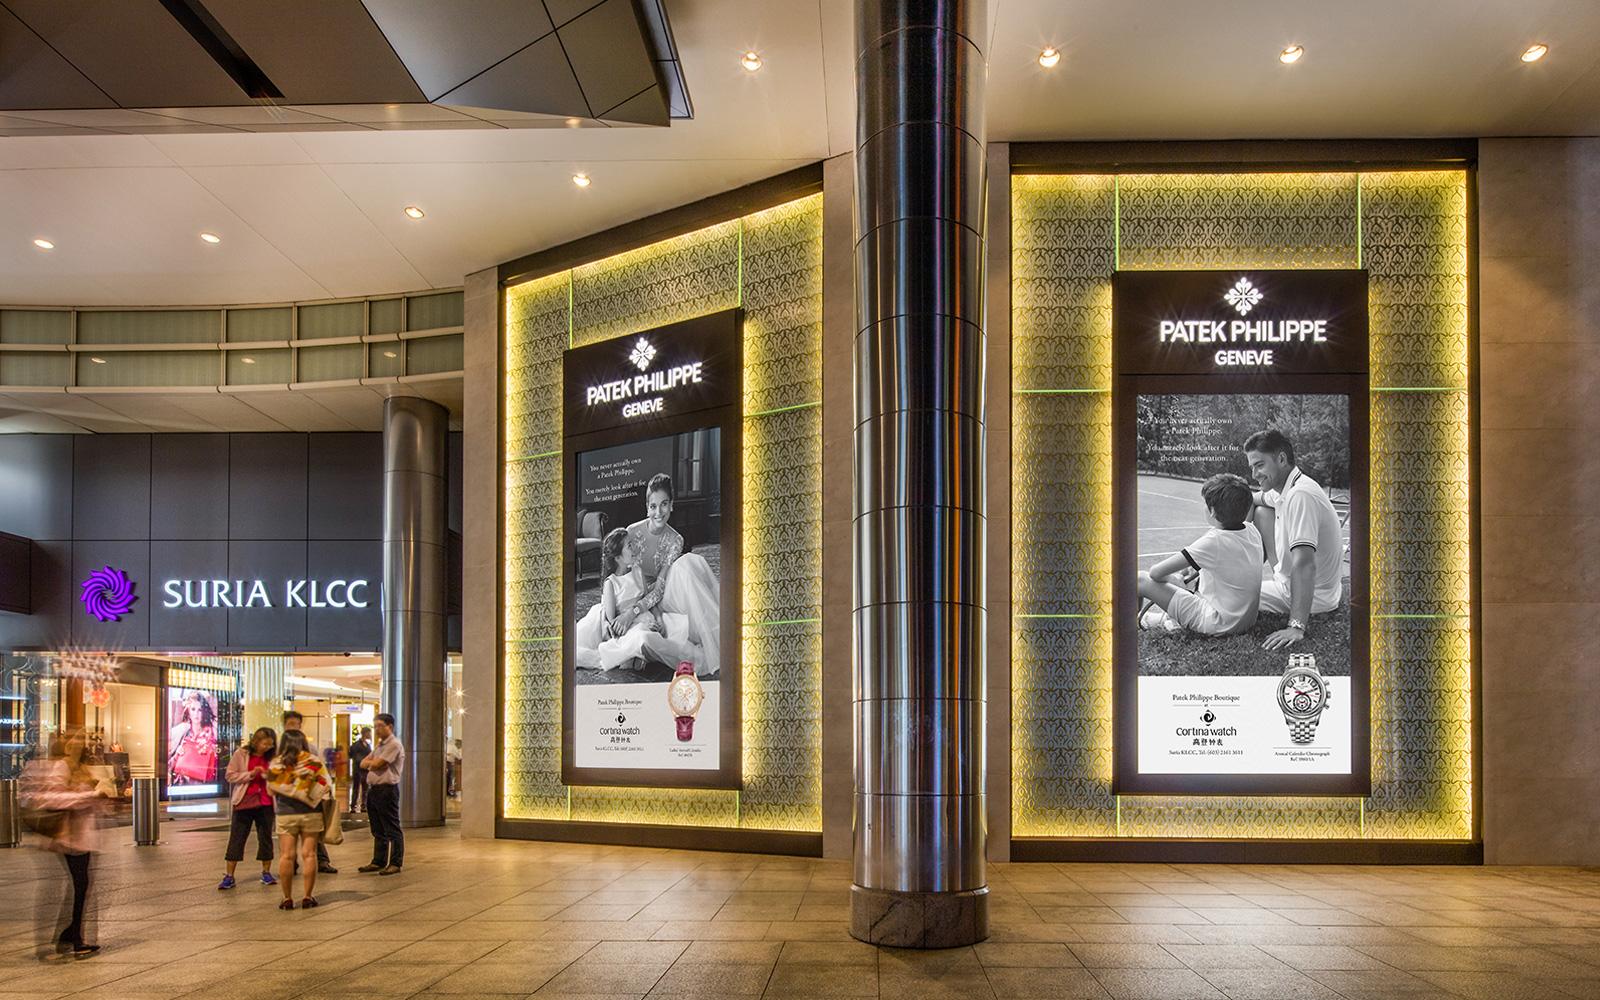 The new Patek Philippe boutique at Suria KLCC